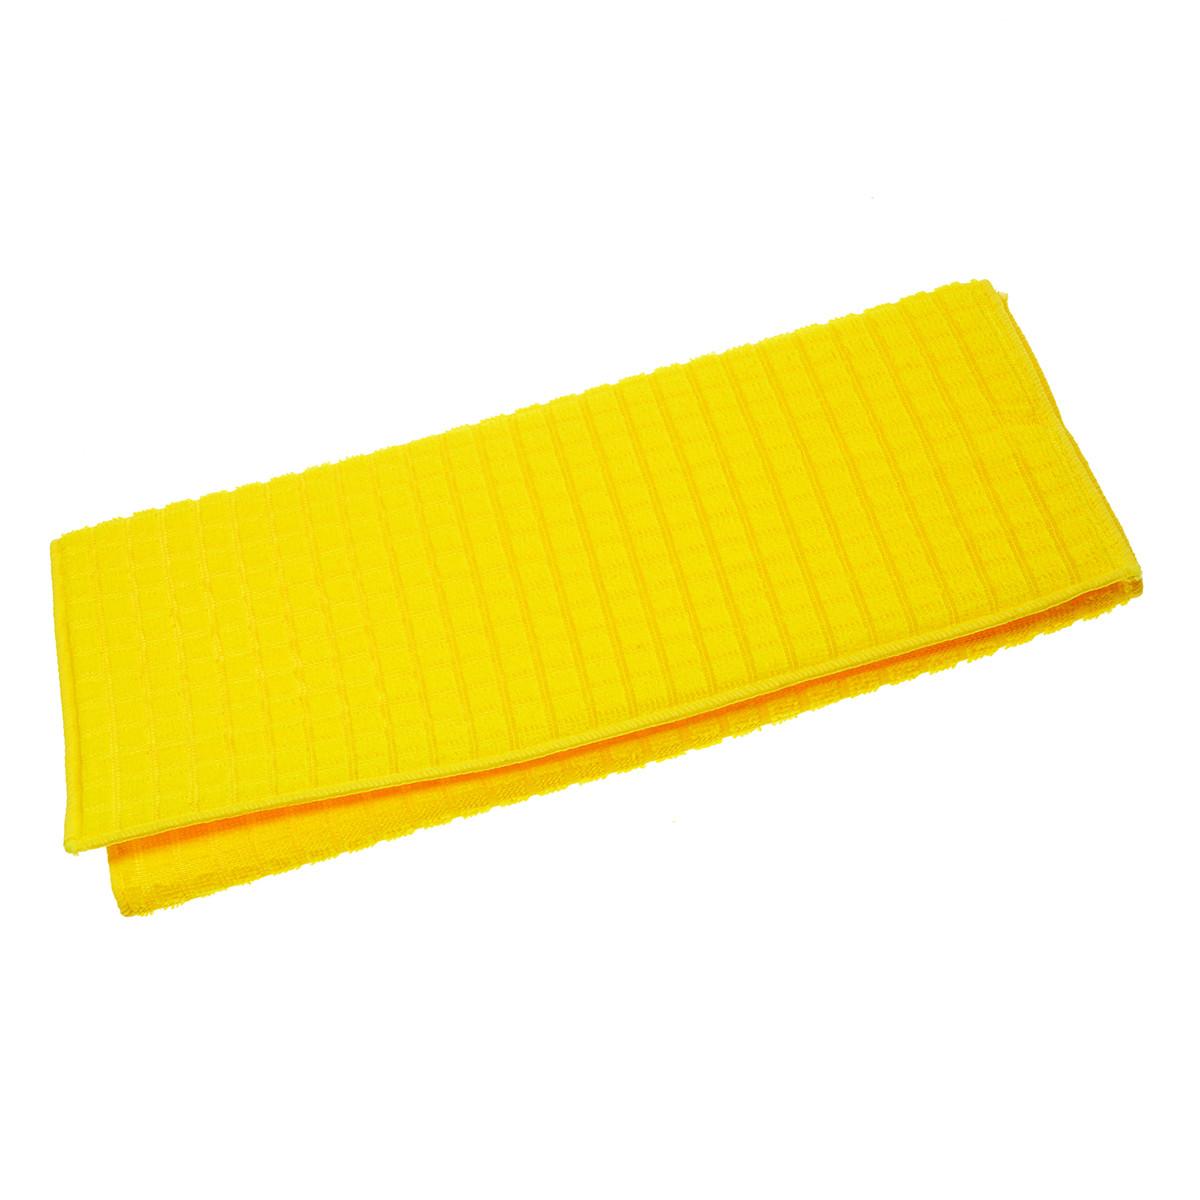 Коврик для сушки посуды 38Х51 см желтый